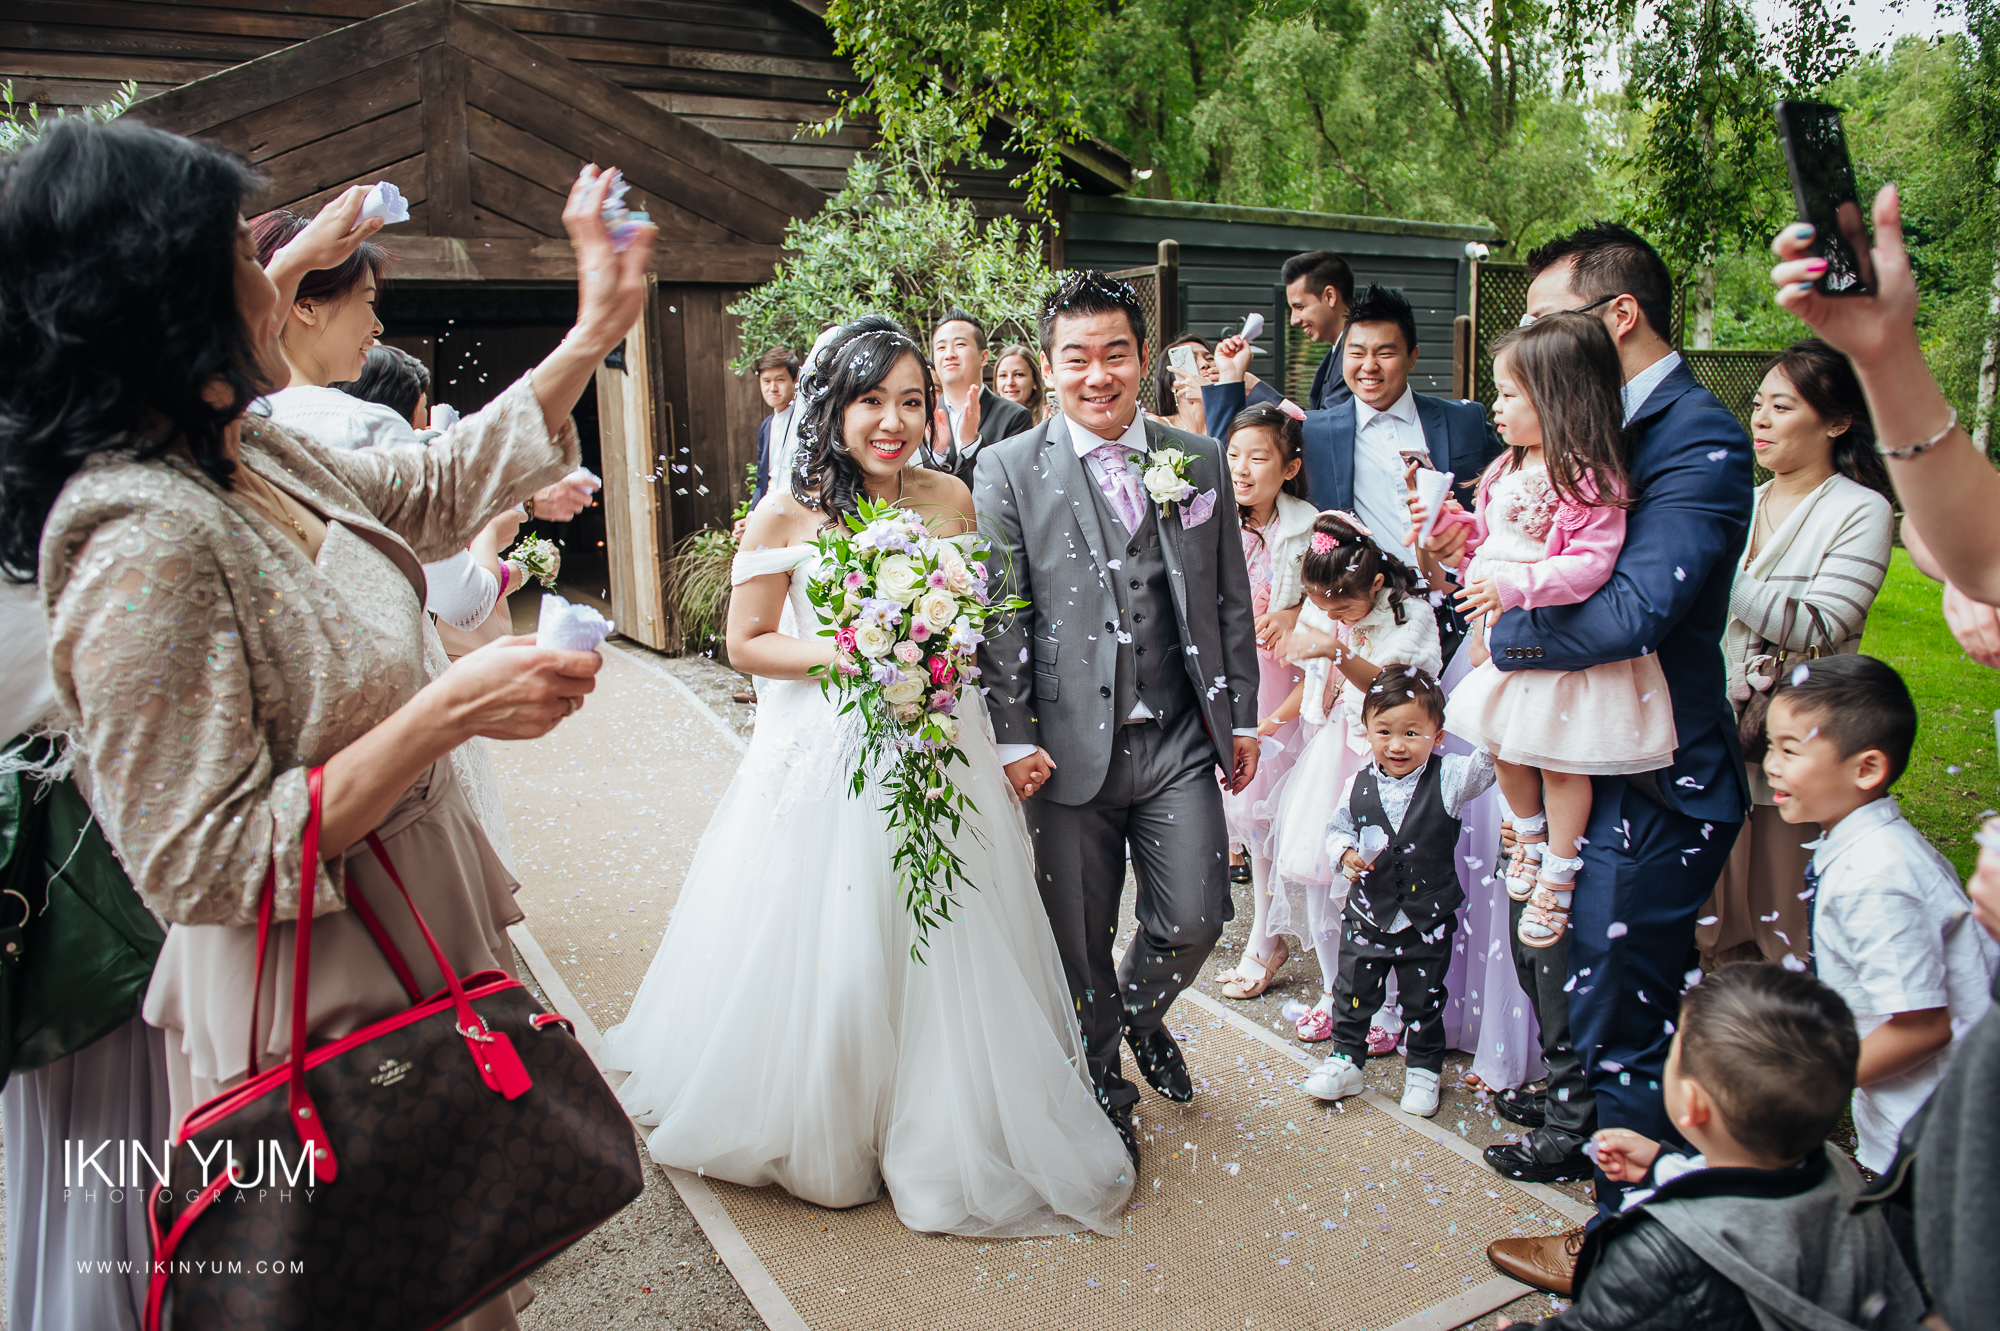 Hampton Manor Wedding - Ikin Yum Photography -094.jpg